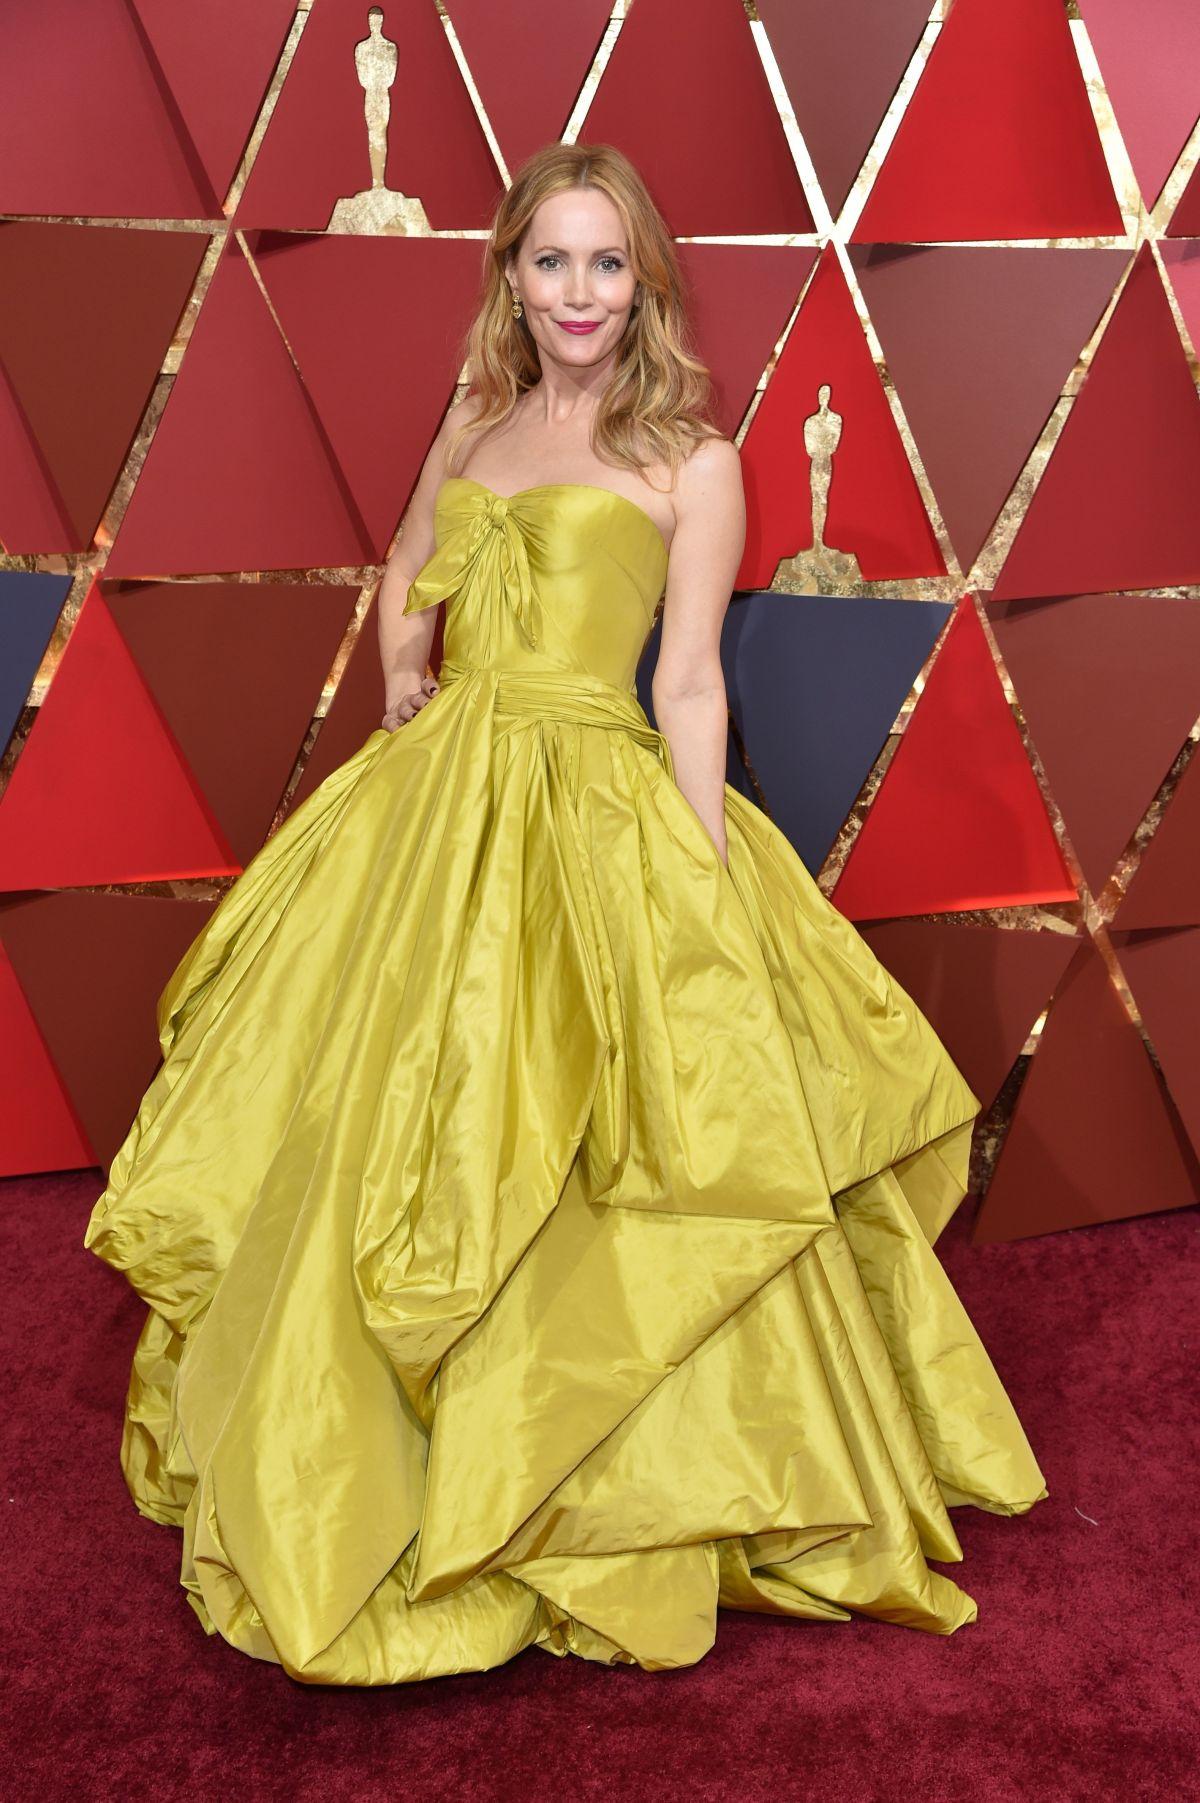 LESLIE MANN at 89th Annual Academy Awards in Hollywood 02/26/2017